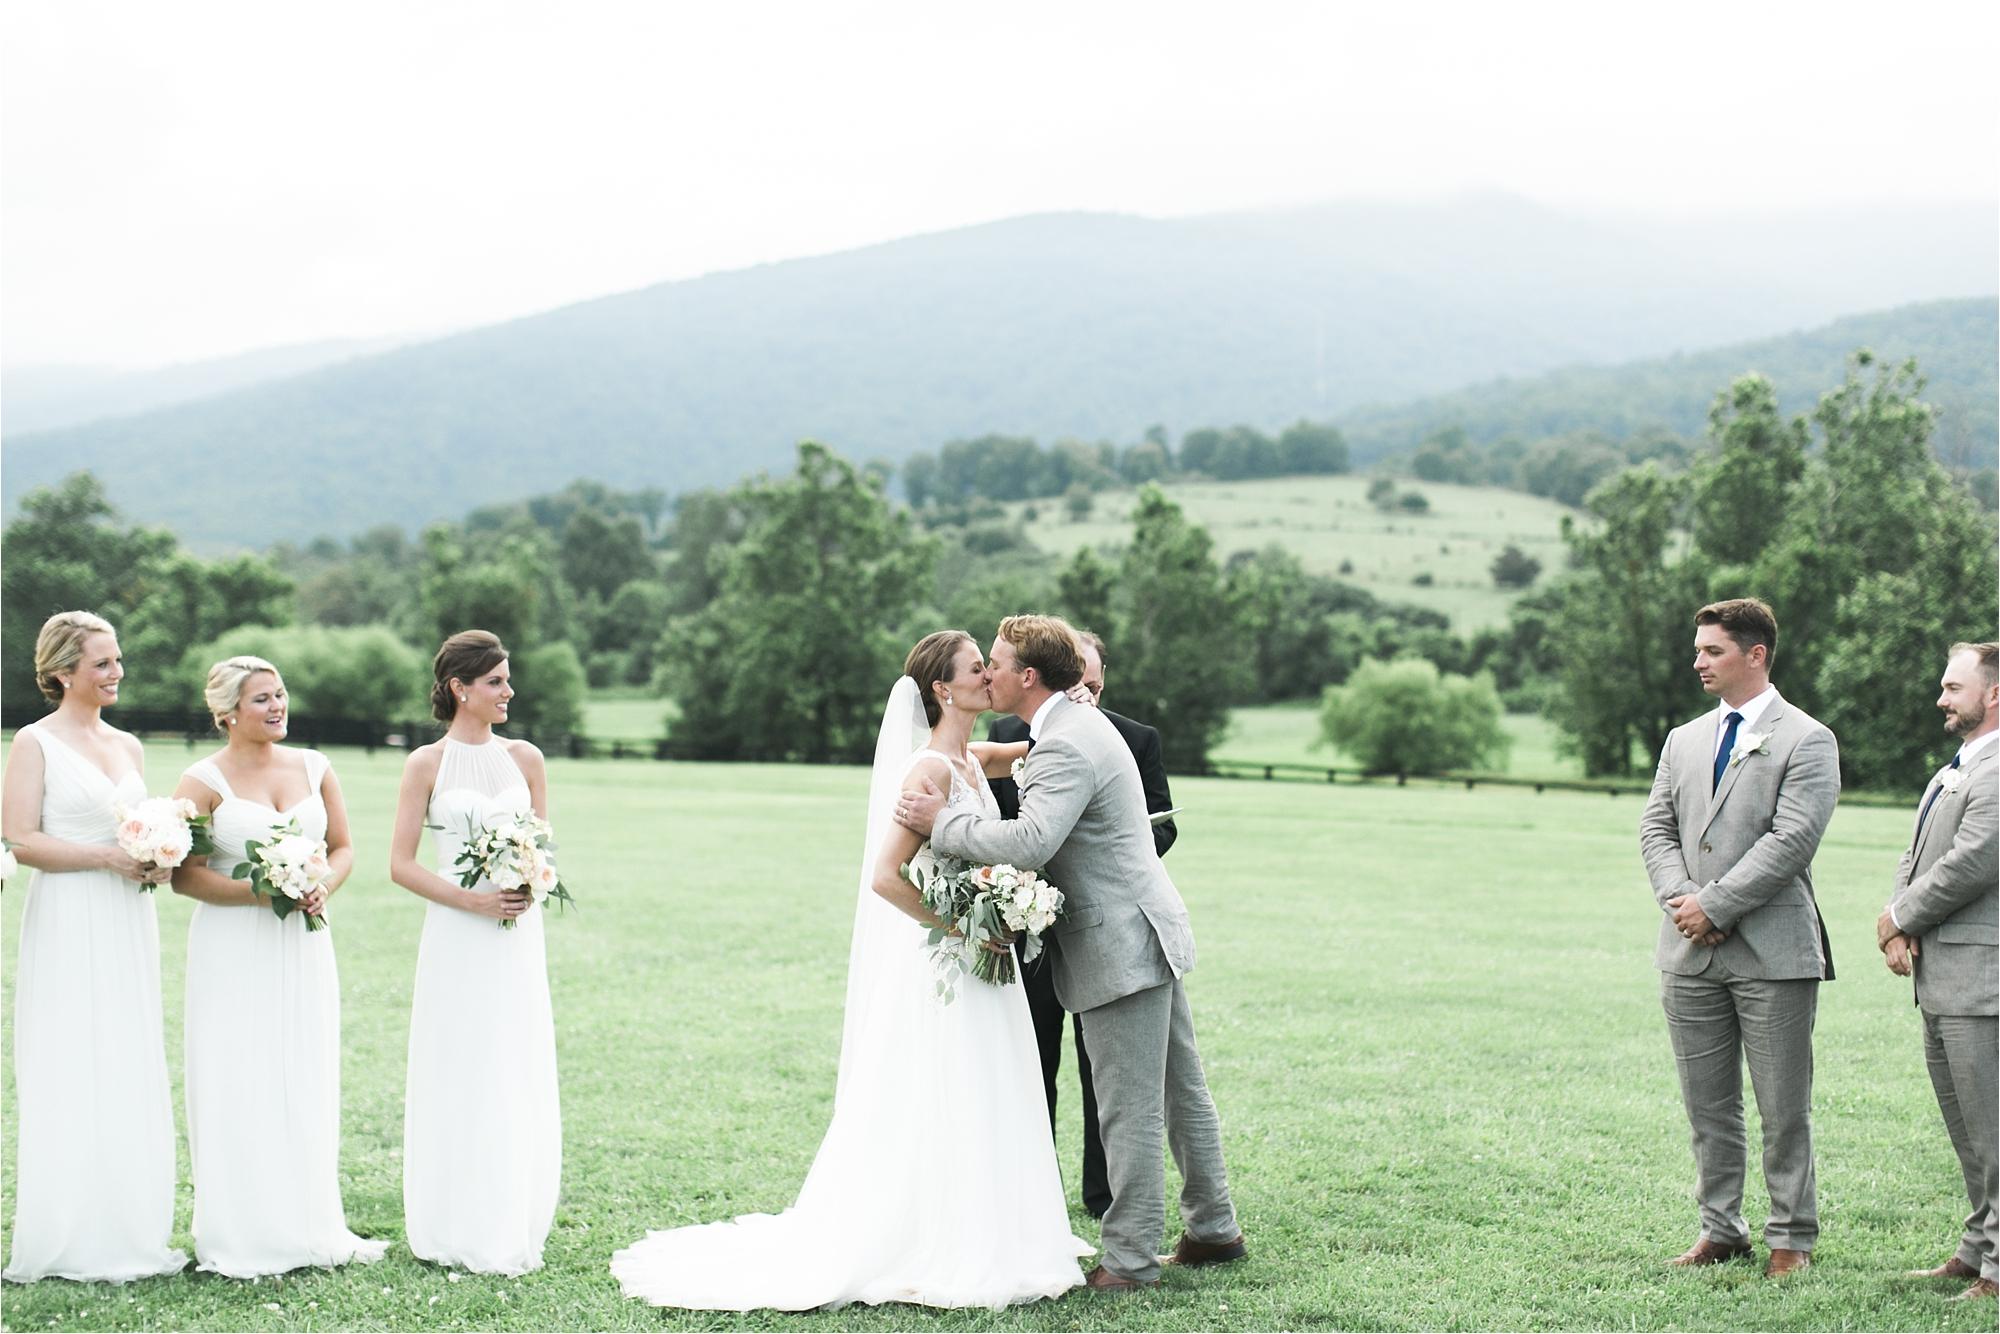 stephanie-yonce-charlottesville-virginia-king-family-vineyard-wedding-photos_0037.jpg